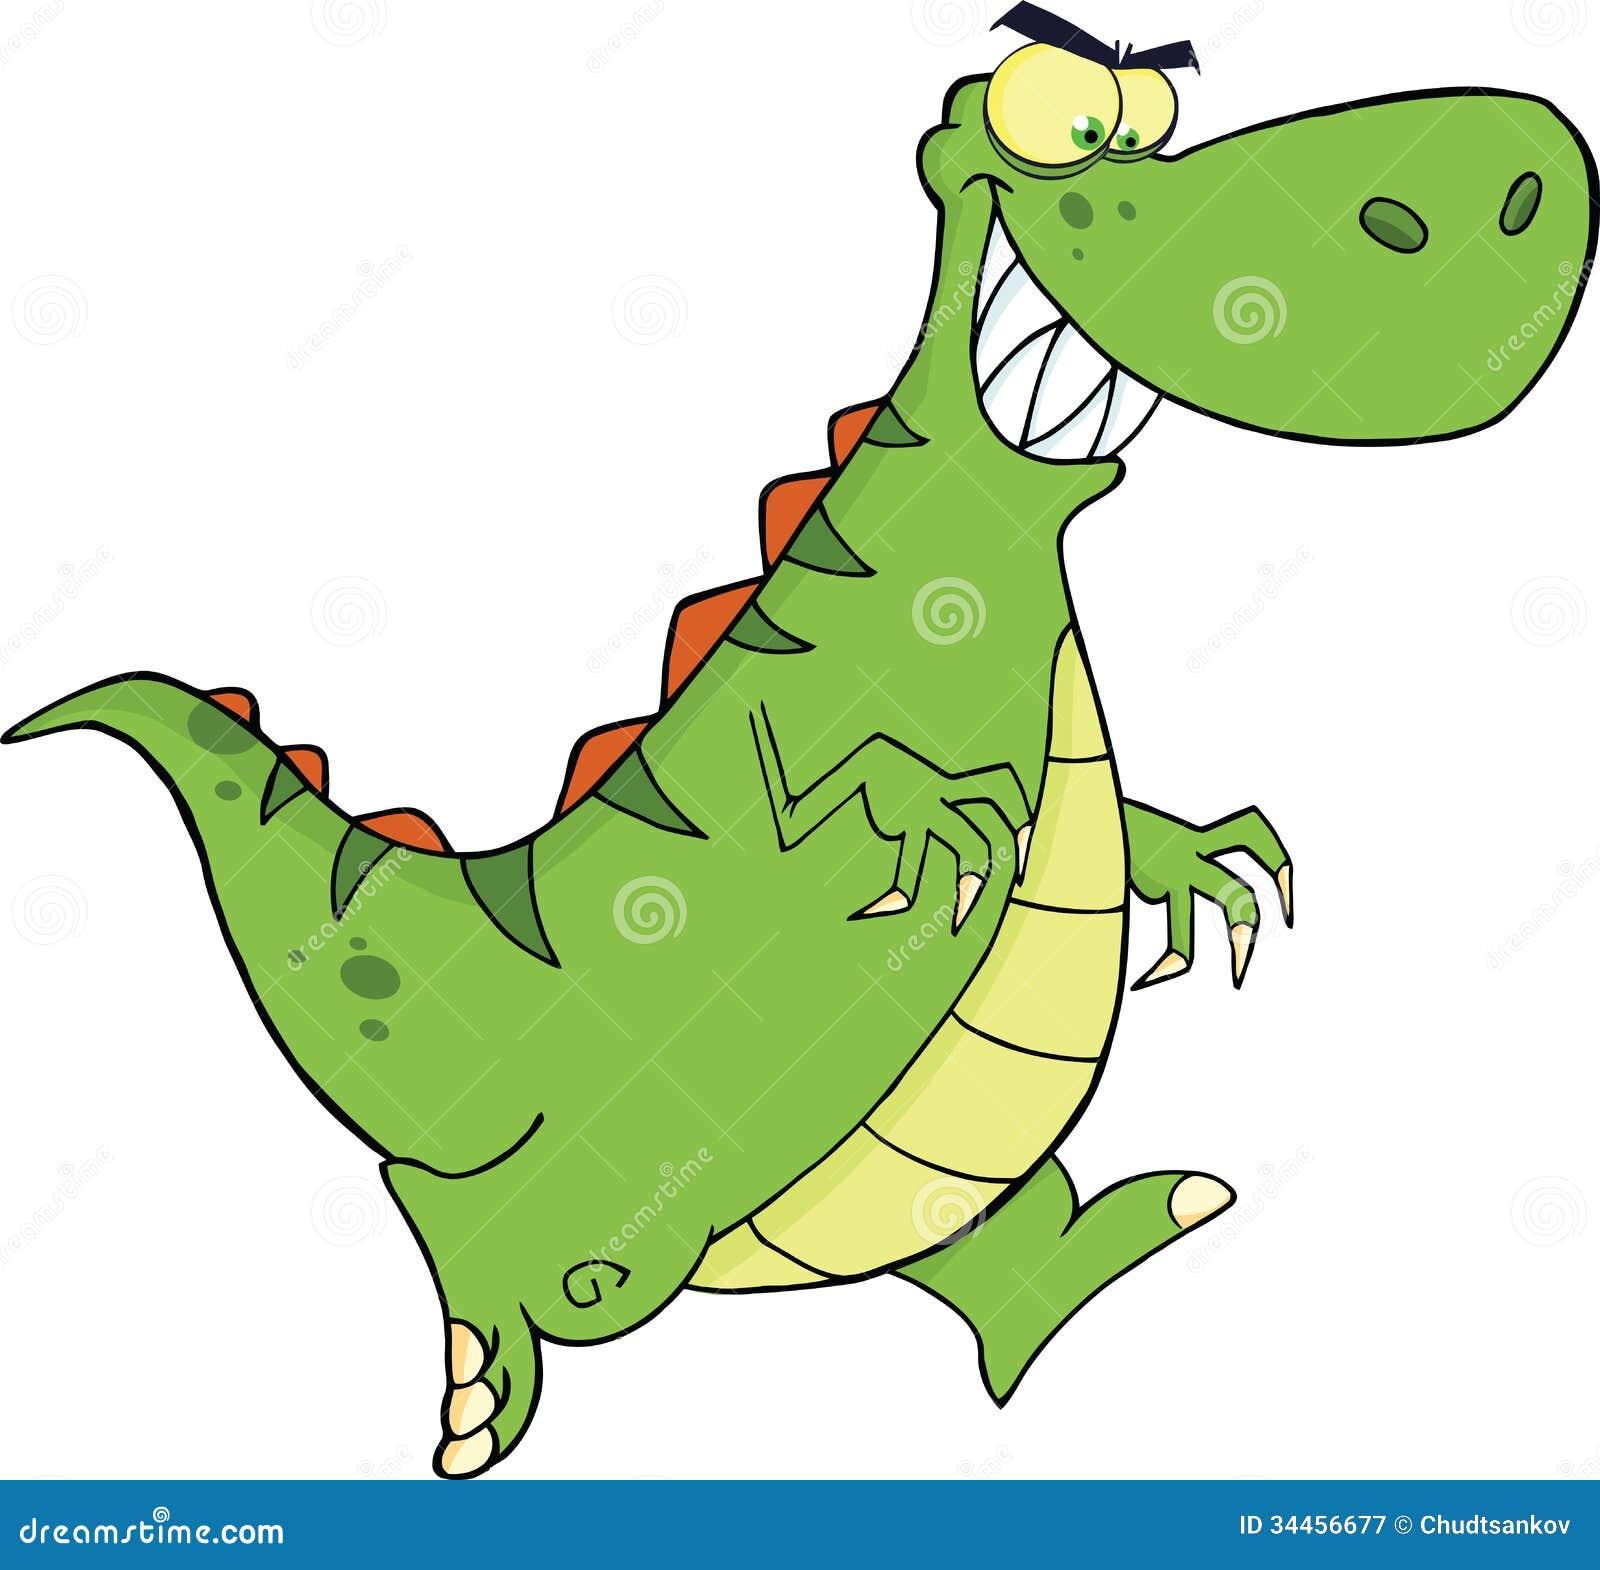 t-rex картинки